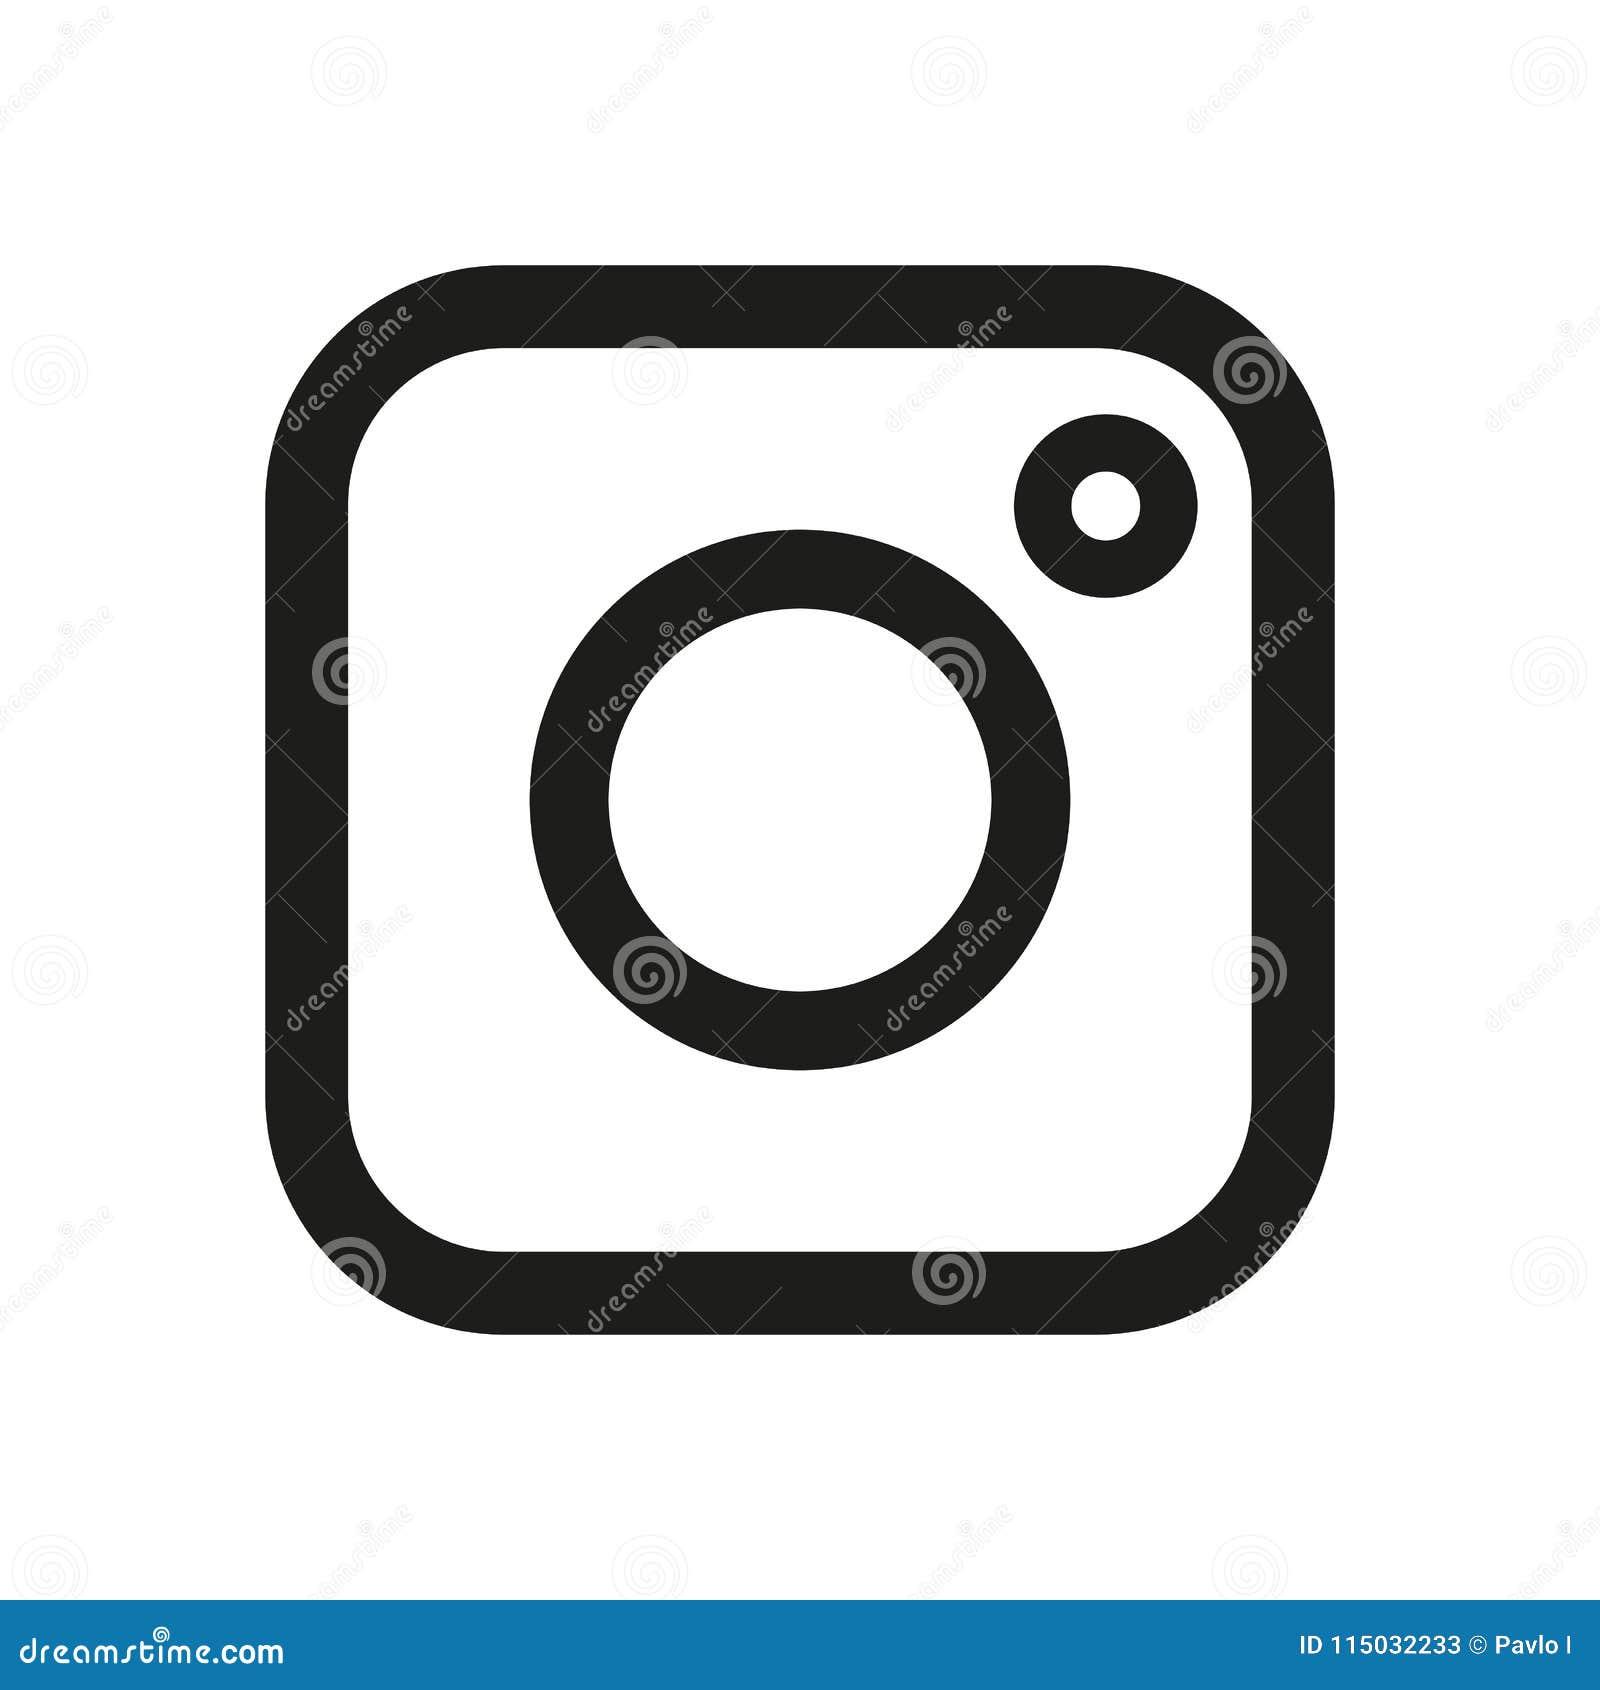 Vector Illustration Instagram: Social Media Icon, Photo Camera Instagram Icons Stock